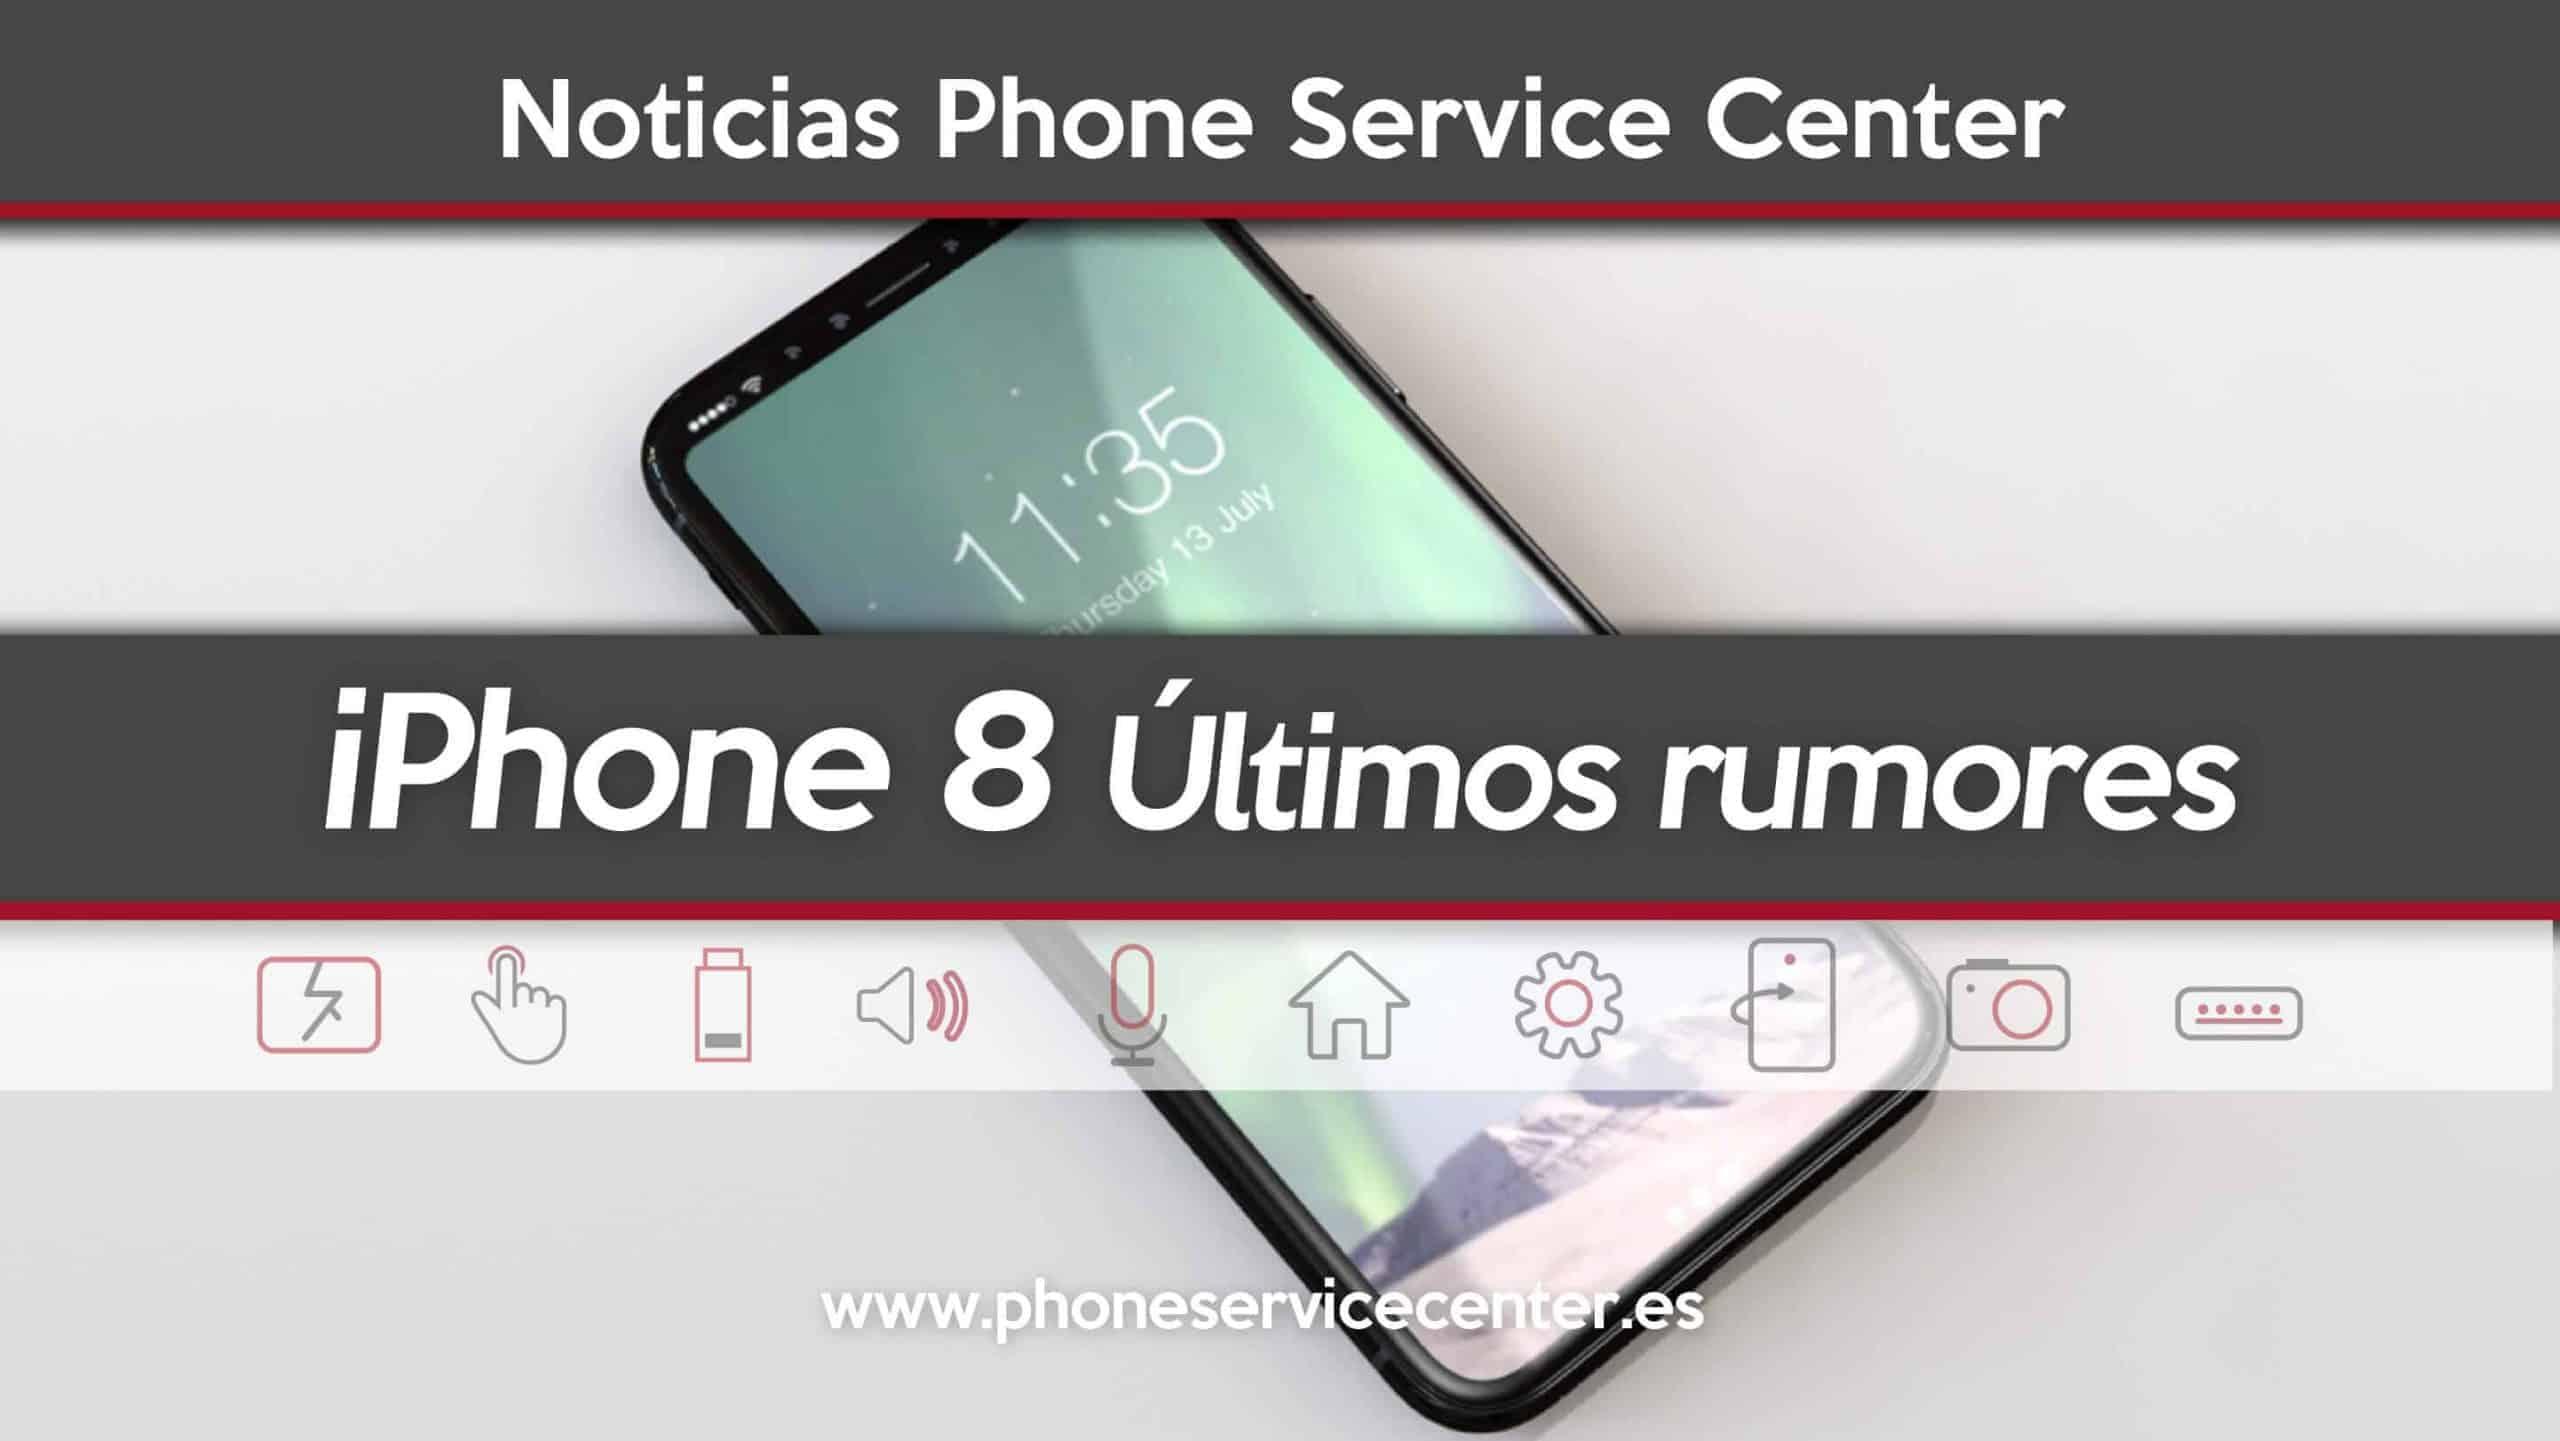 Ultimos rumores del iPhone 8